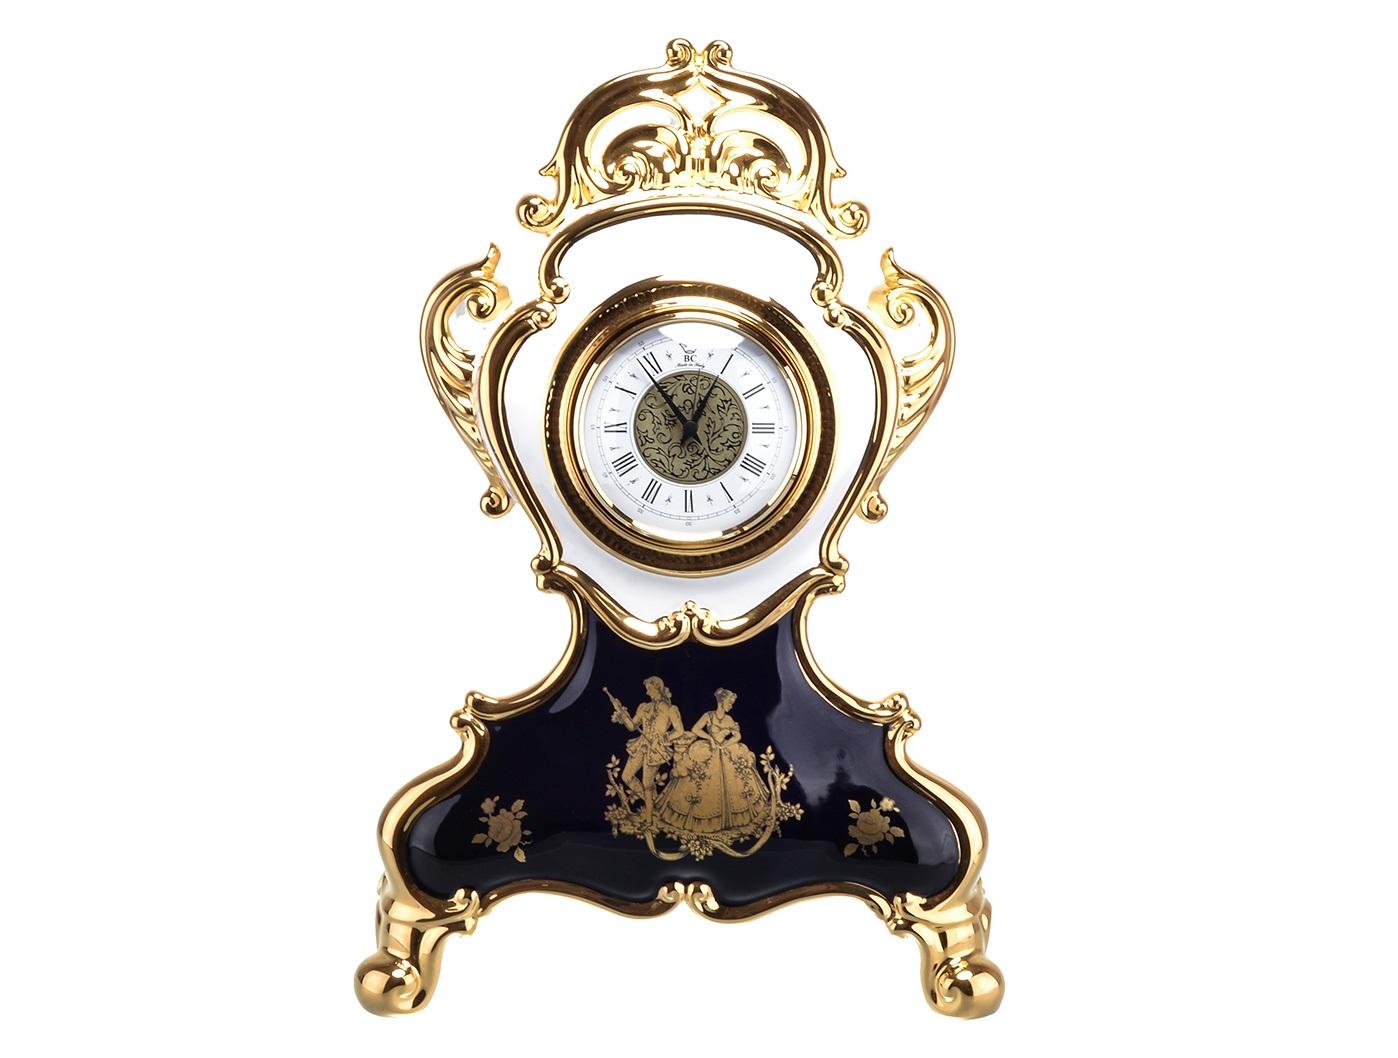 Часы bruno costenaro (bruno costenaro) мультиколор.